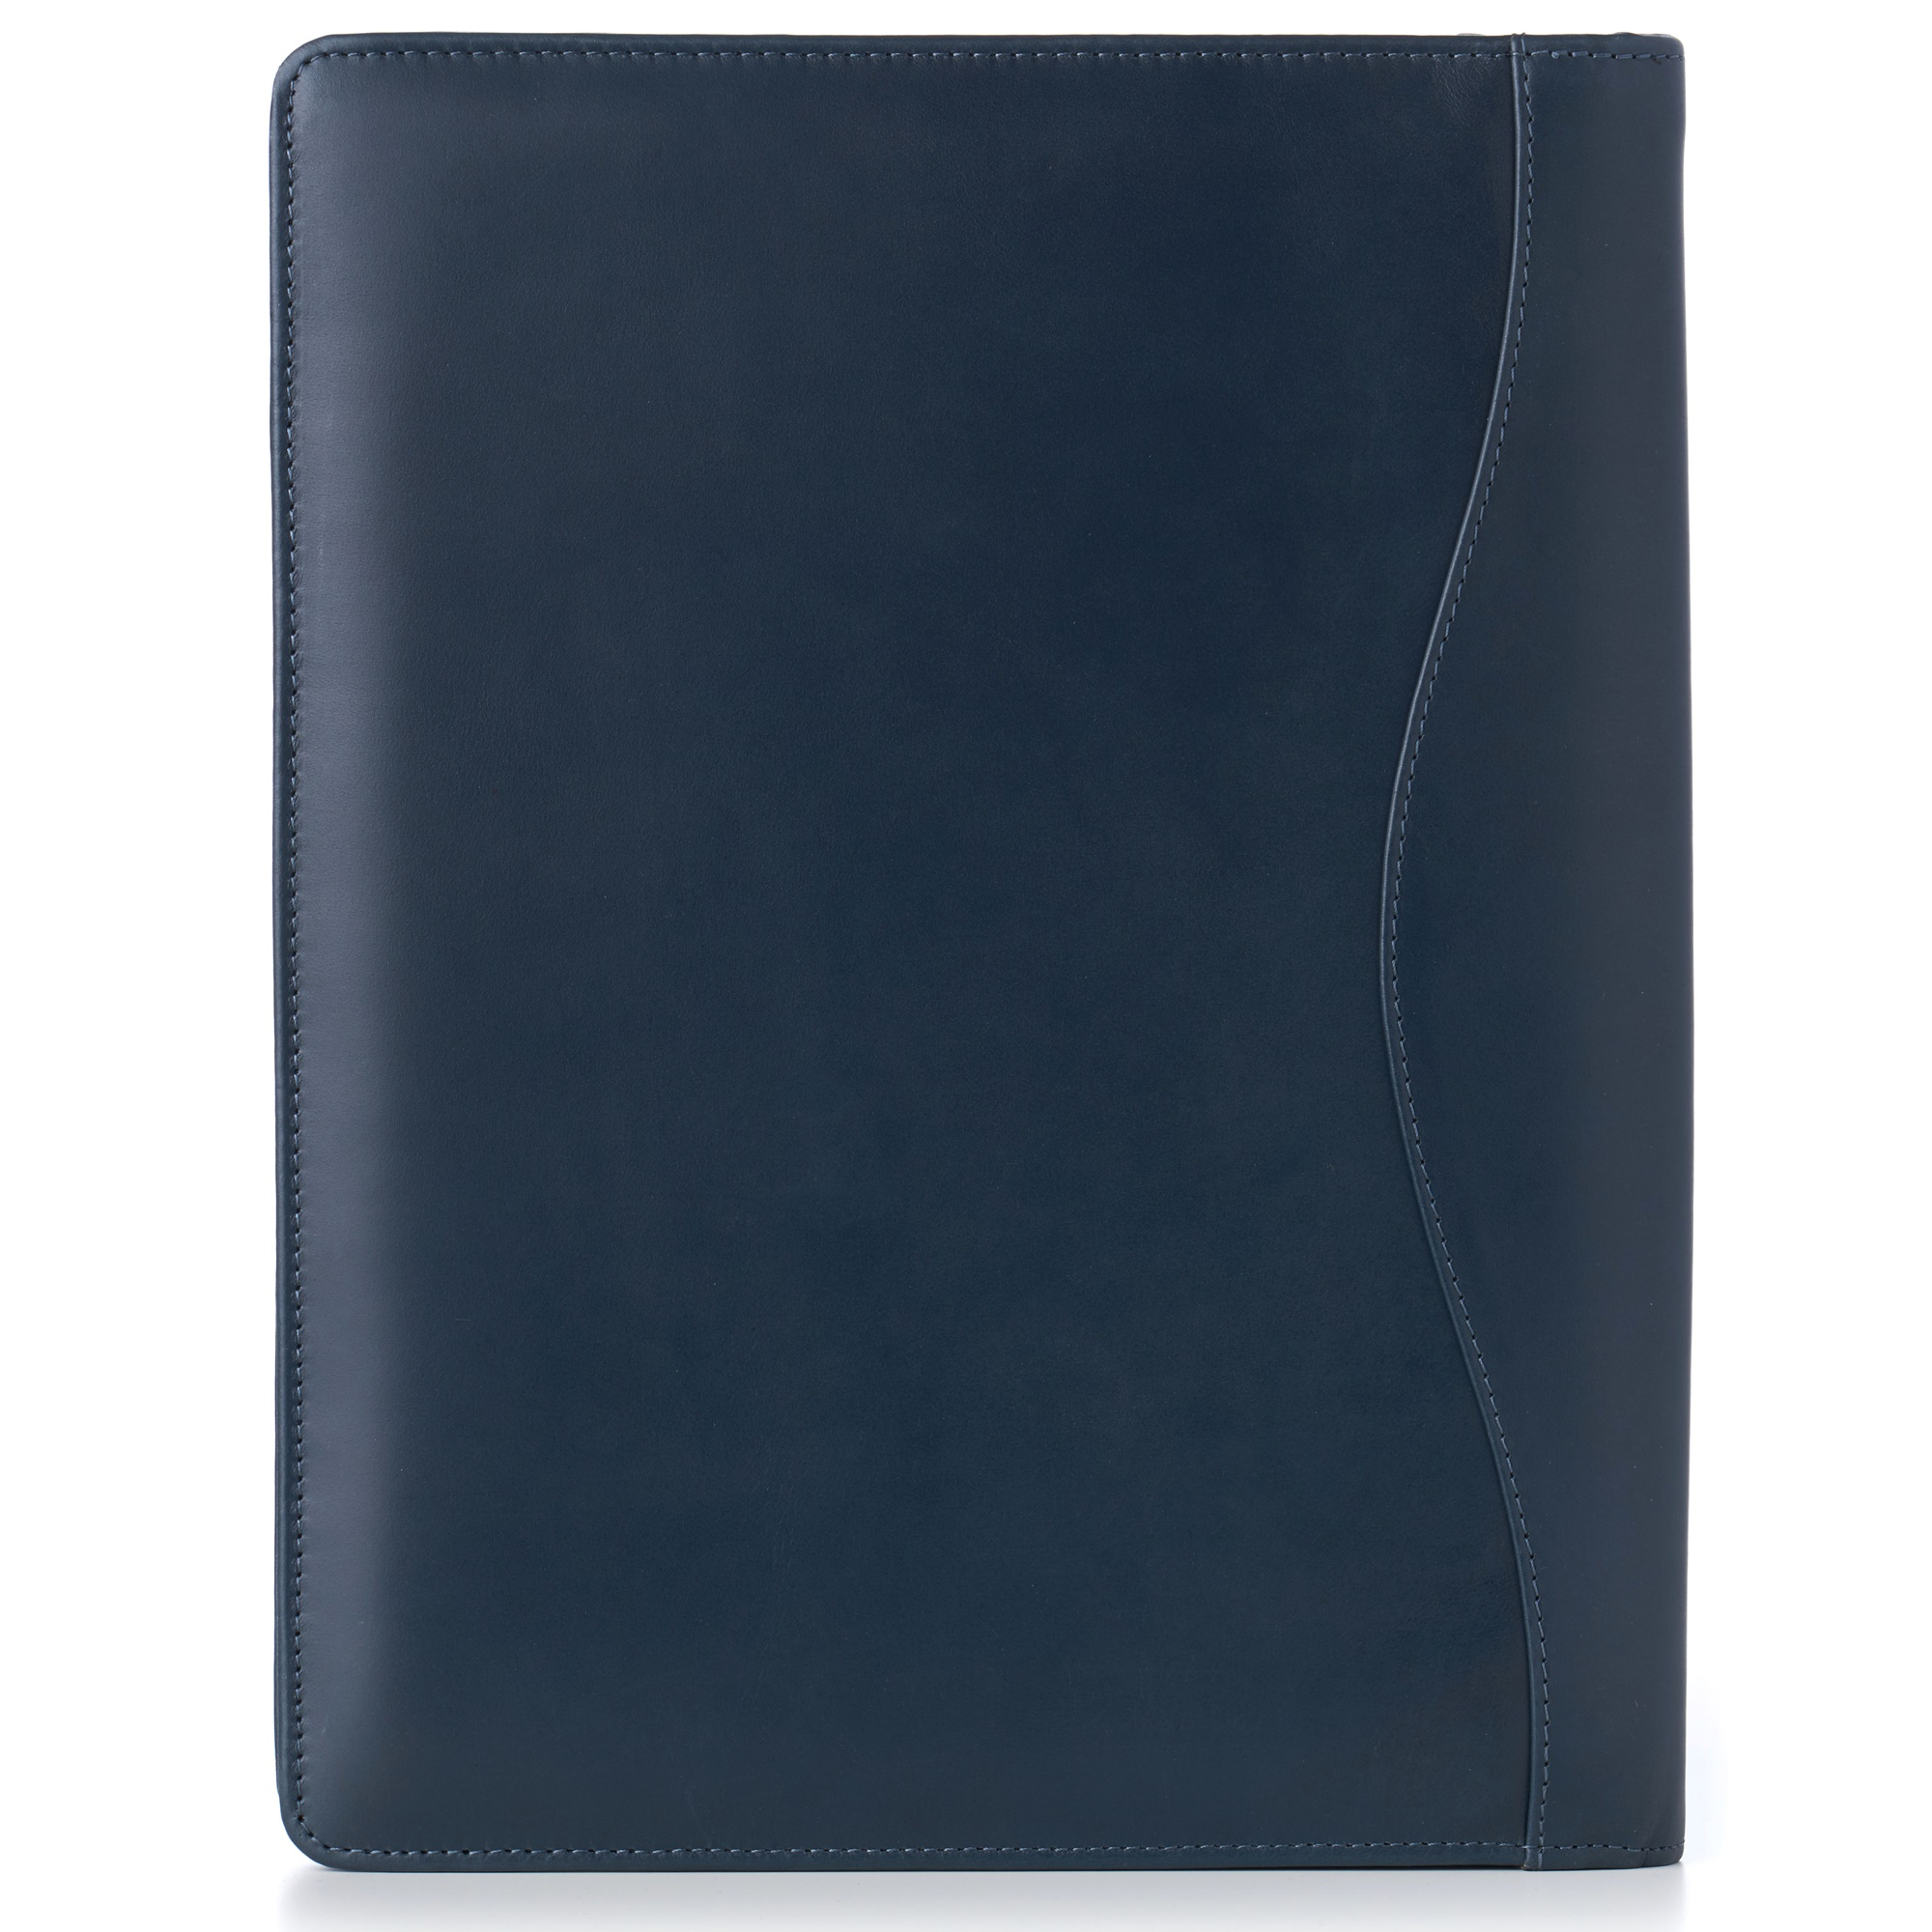 thumbnail 34 - Alpine Swiss Leather Zippered Writing Pad Portfolio Business Briefcase Organizer